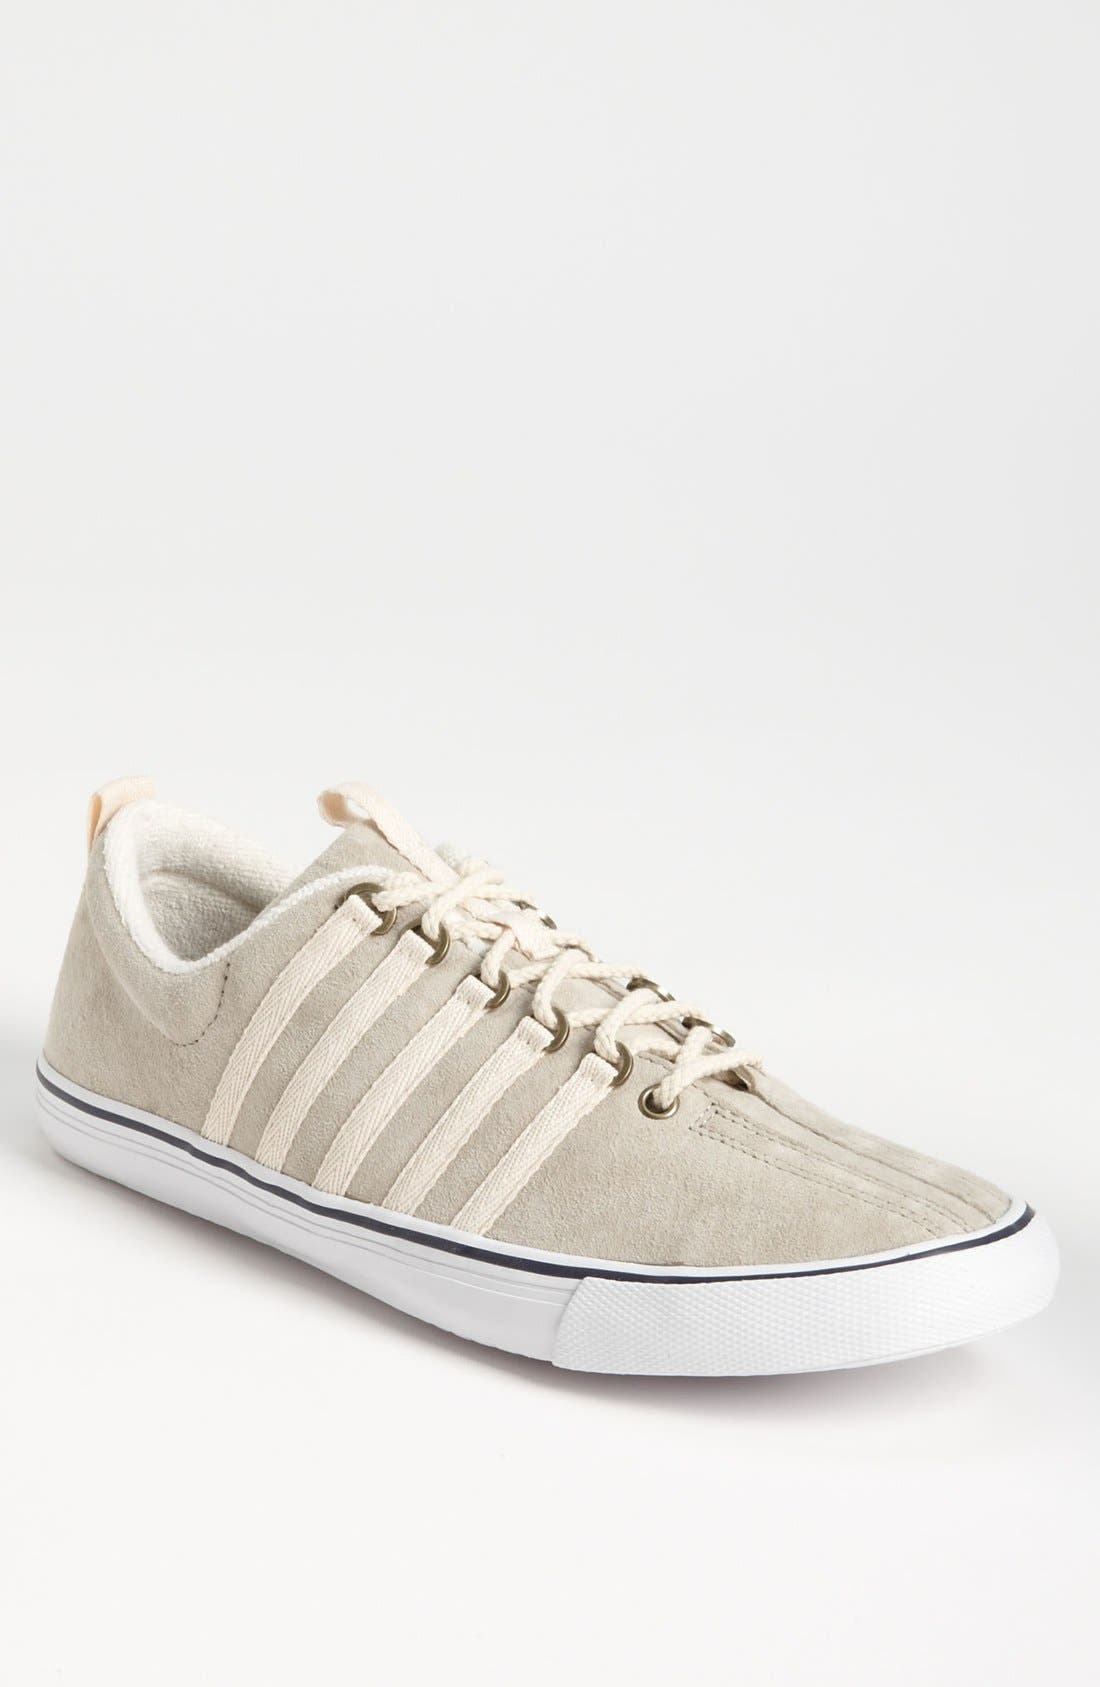 'Billy Reid Venice' Suede Sneaker,                             Main thumbnail 1, color,                             052